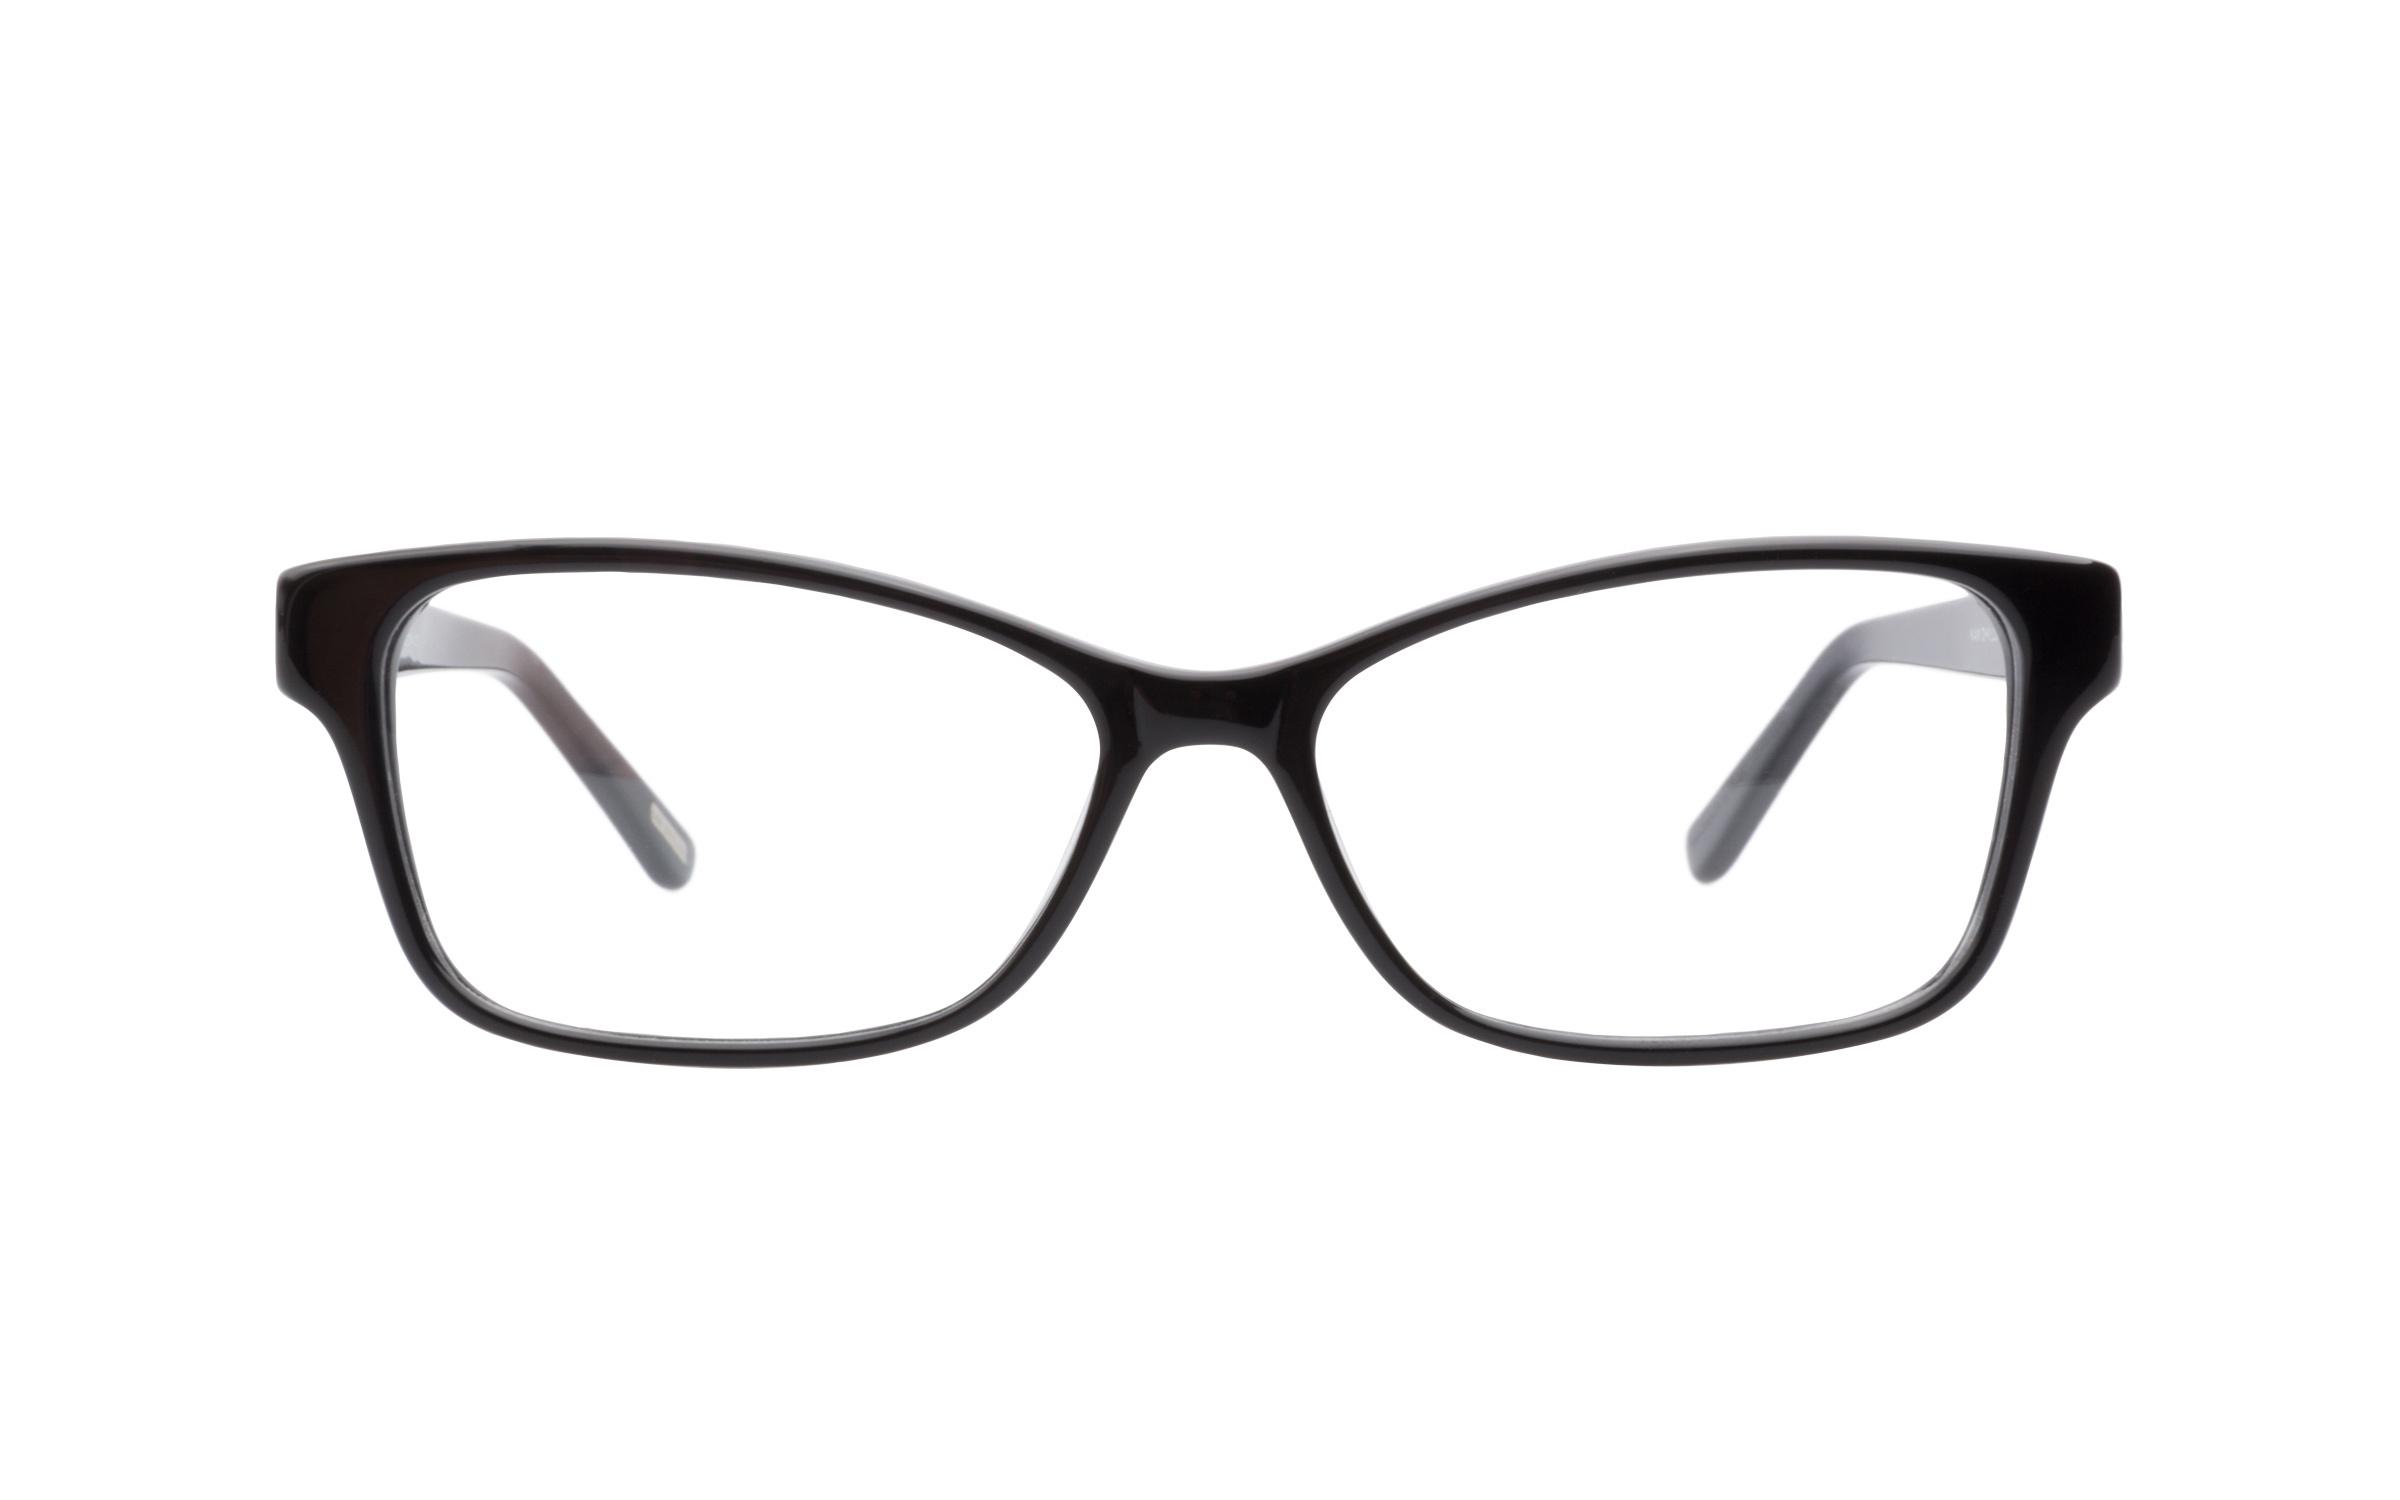 Womens_Elegant_Glasses_Black_Kam_Dhillon_Online_Coastal